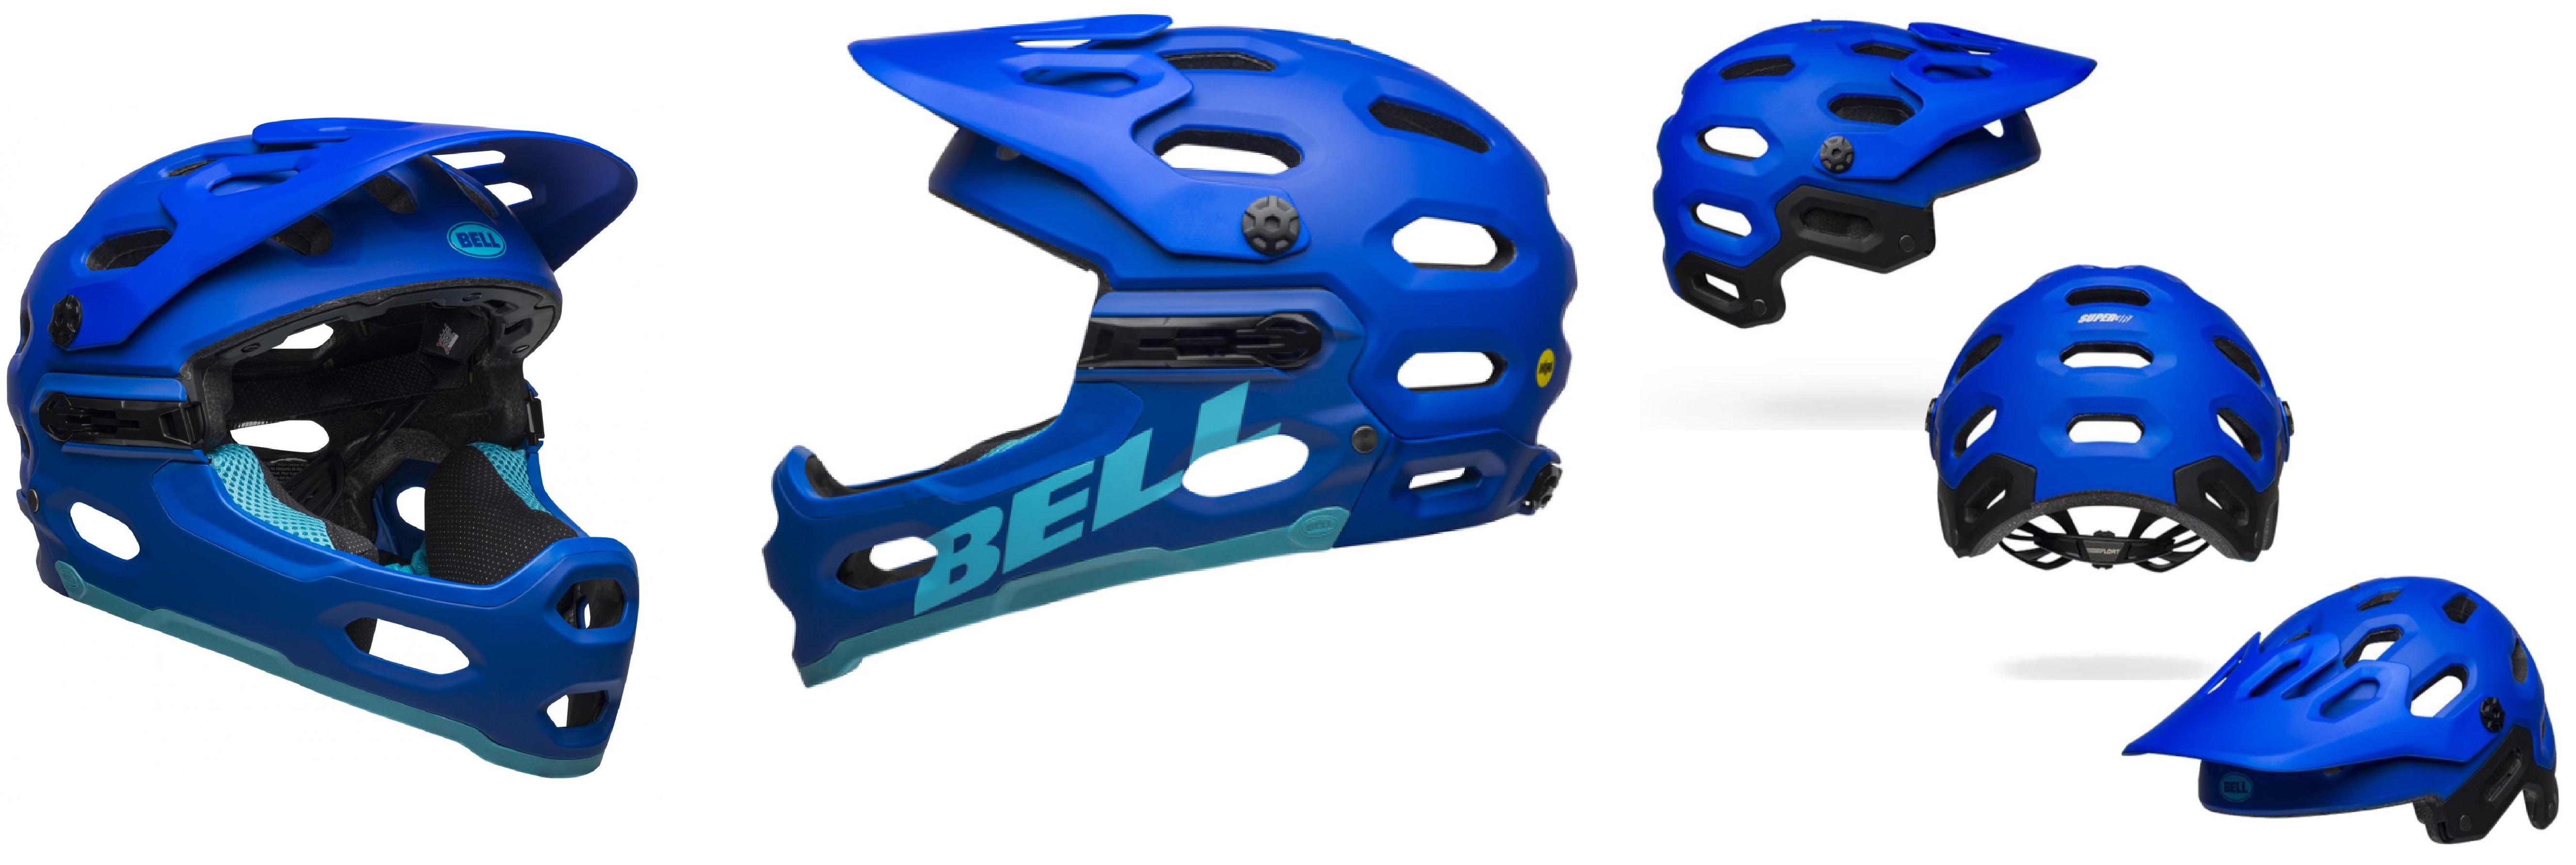 Čelade Bell Super 3R sta pravzaprav dve čeladi v eni!